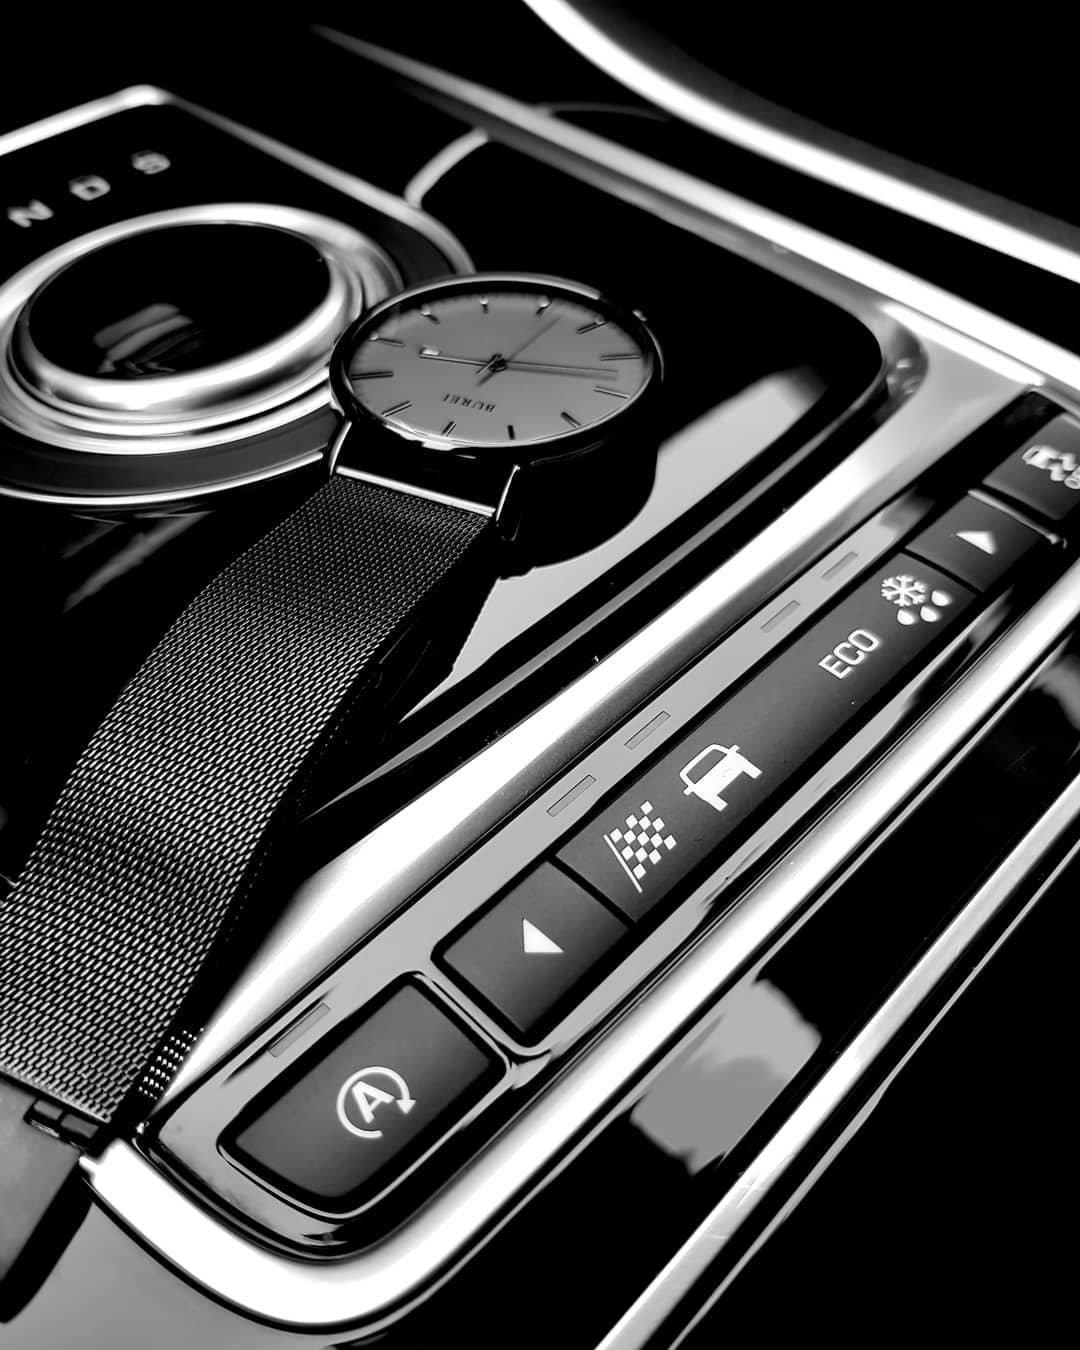 BUREI Men's Fashion Minimalist Wrist Watch Analog Deep Gray Date with Black Mesh Band by BUREI (Image #4)